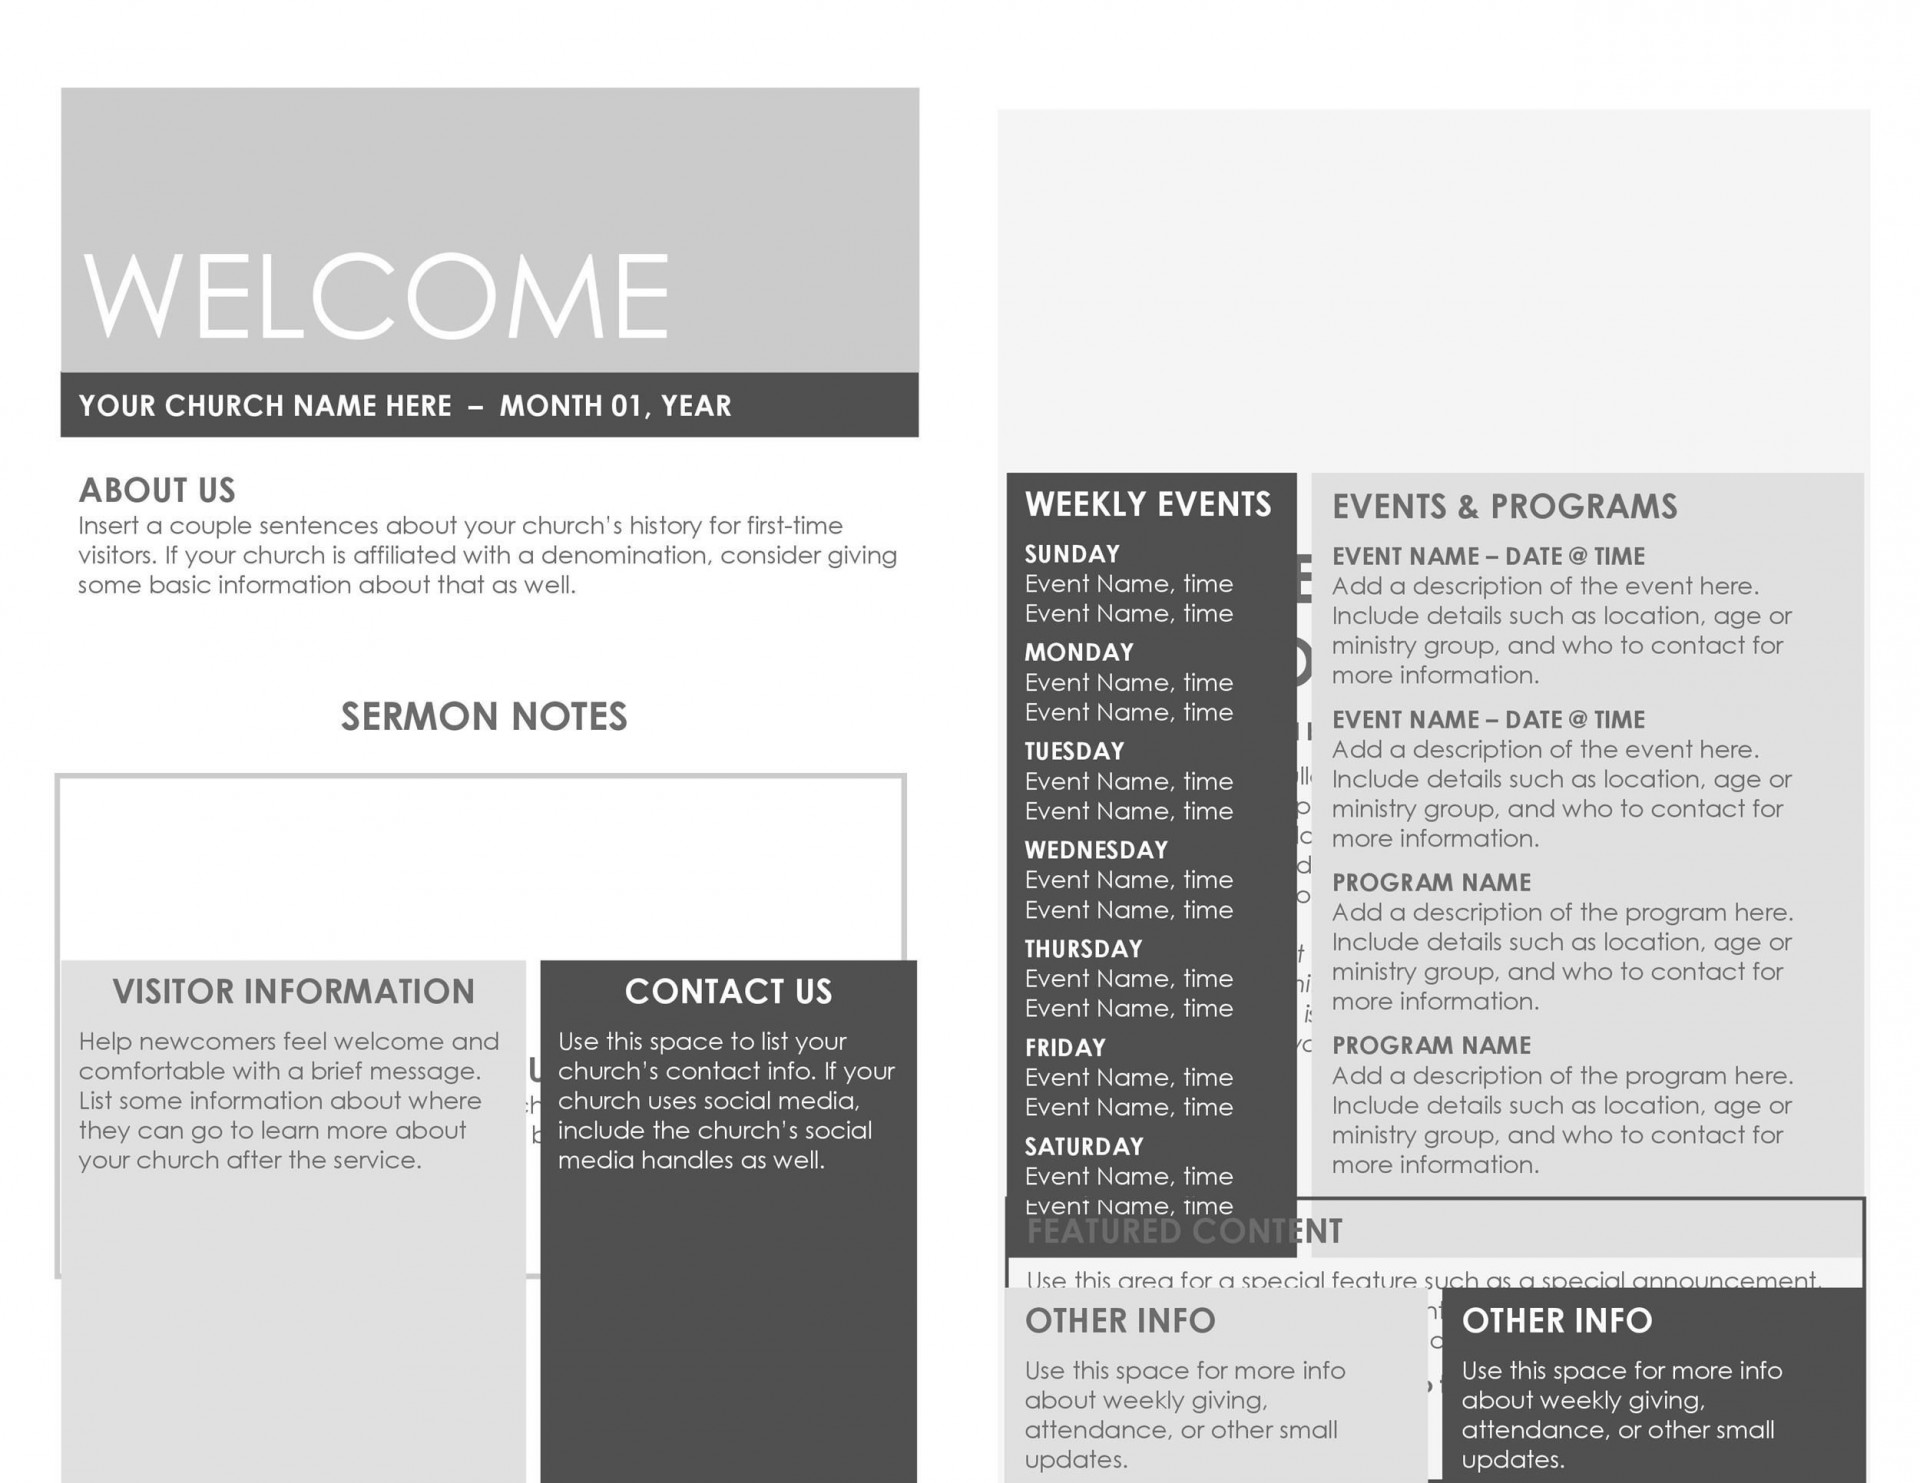 009 Fascinating Free Church Program Template Doc Sample 1920